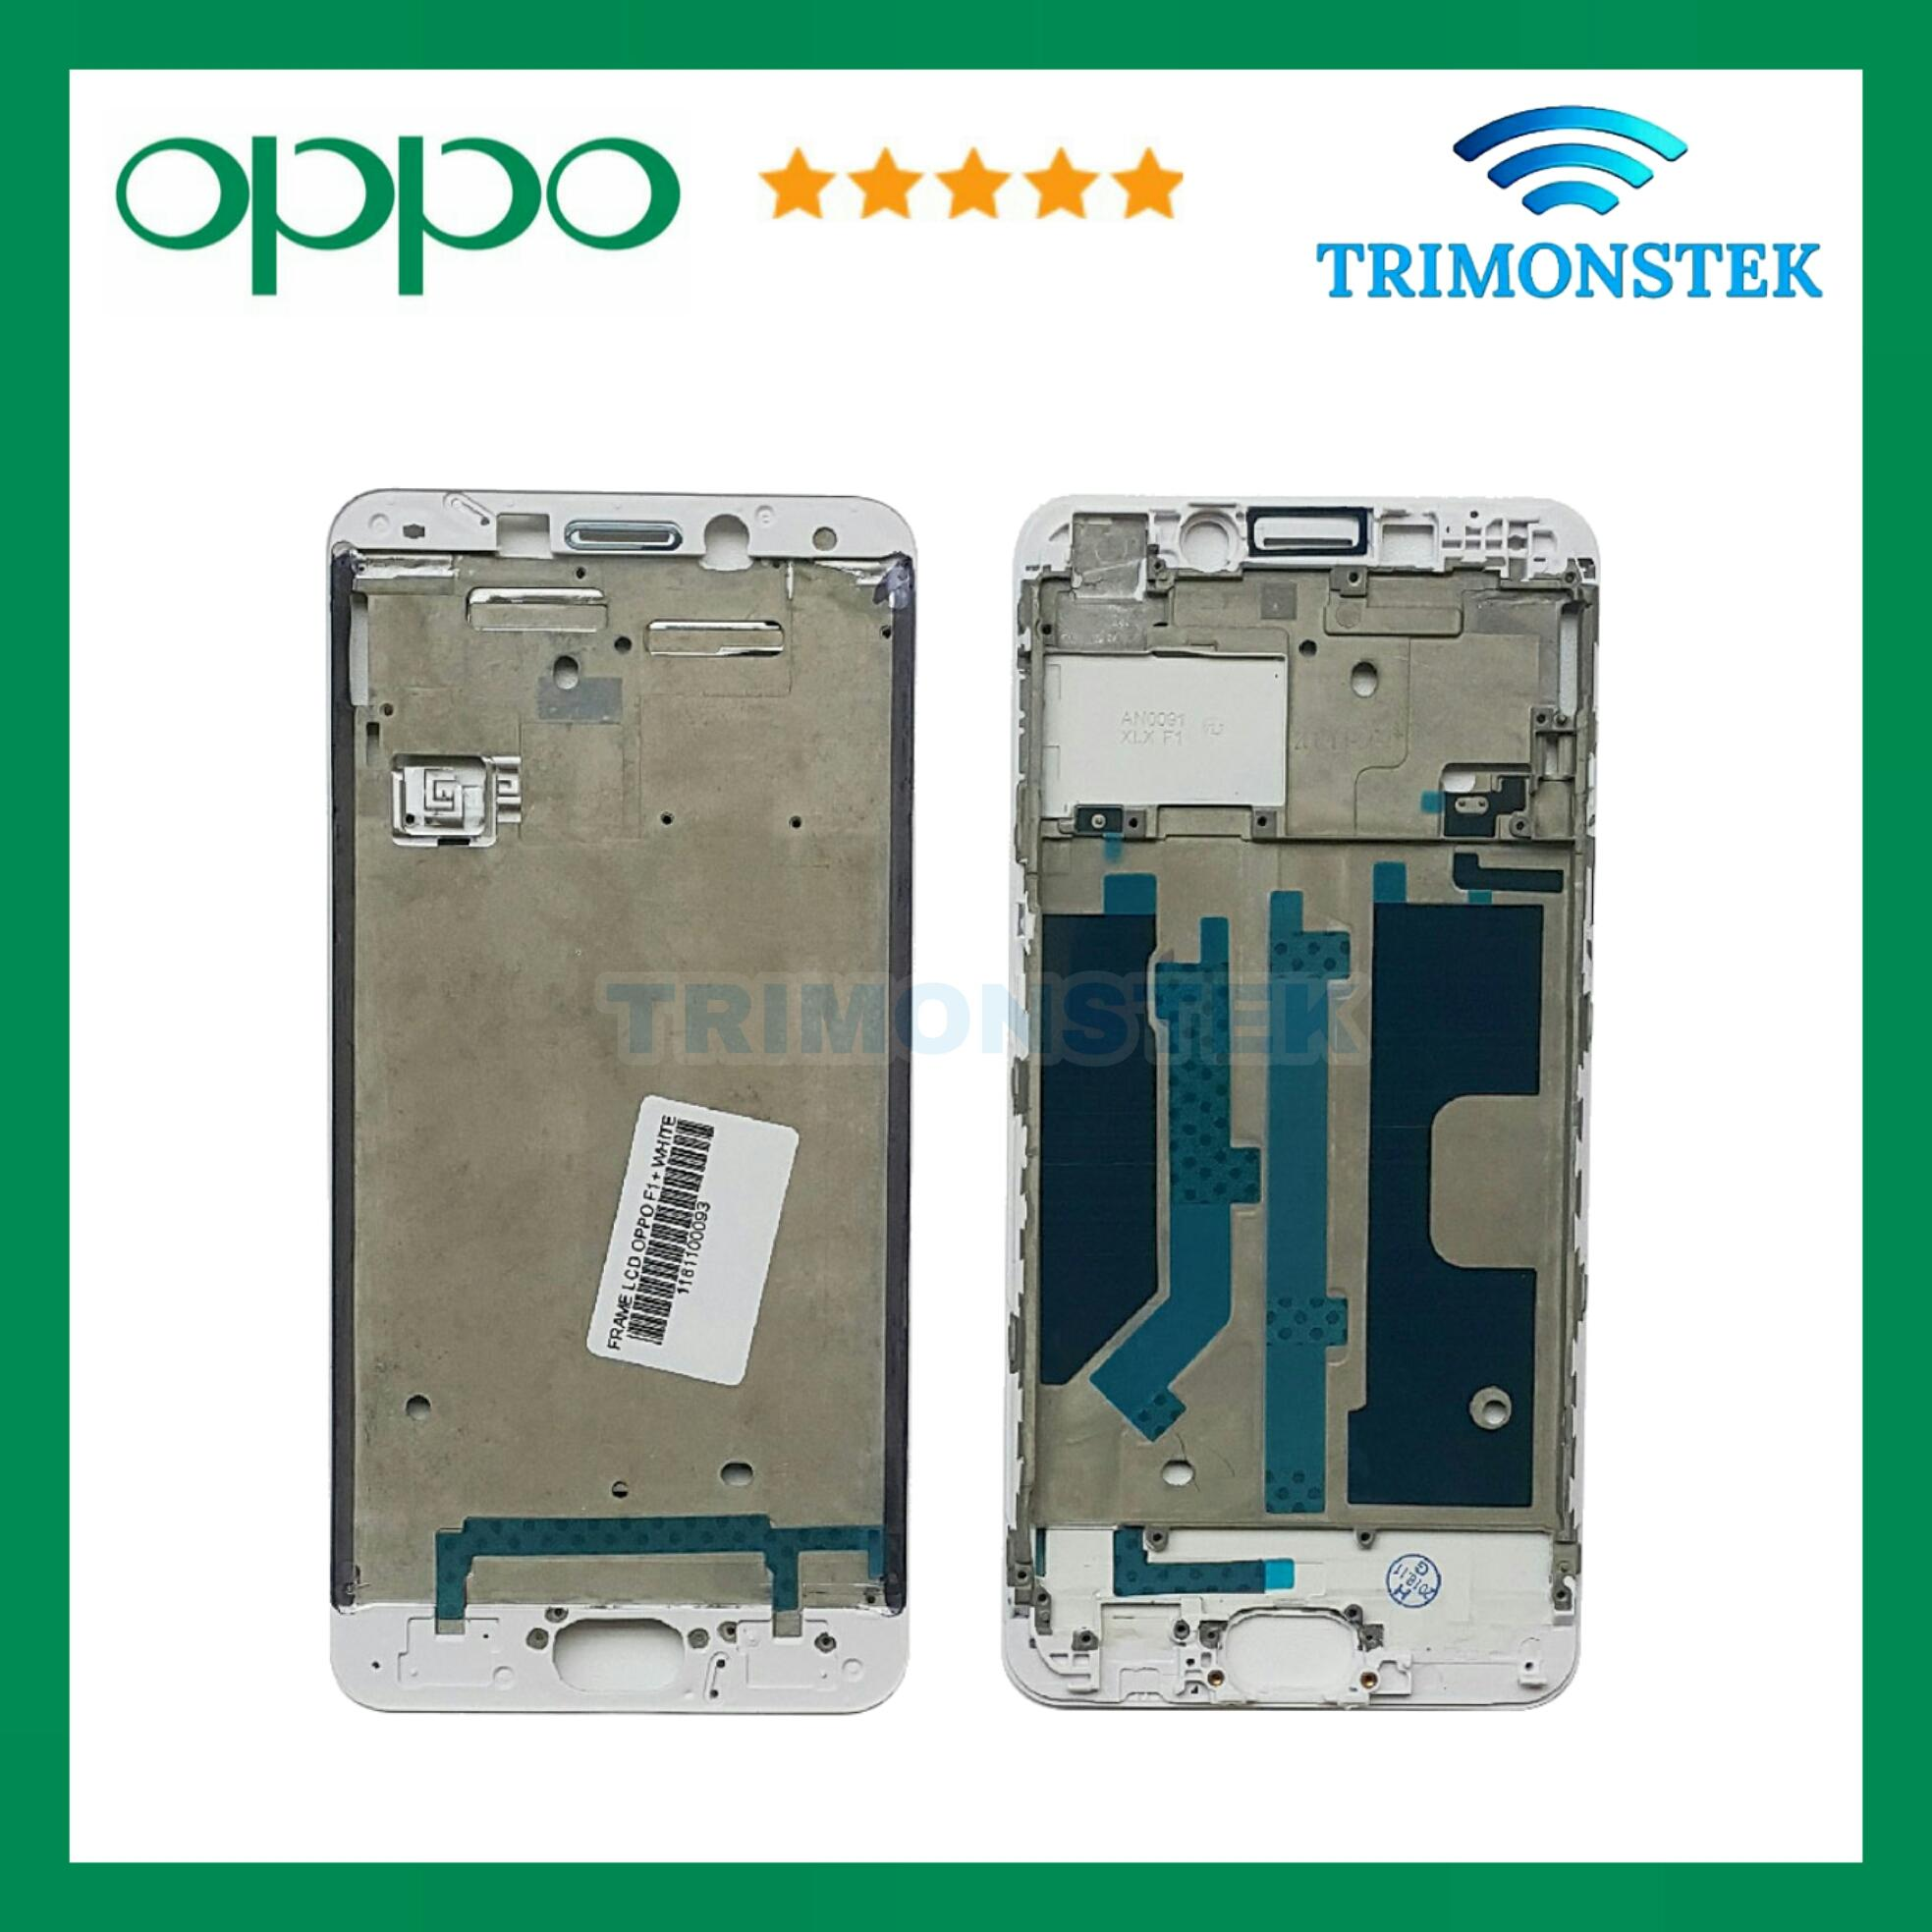 Frame Bazzel Bazel Tulangan Tatakan Lcd Oppo F1+ F1 Plus R9